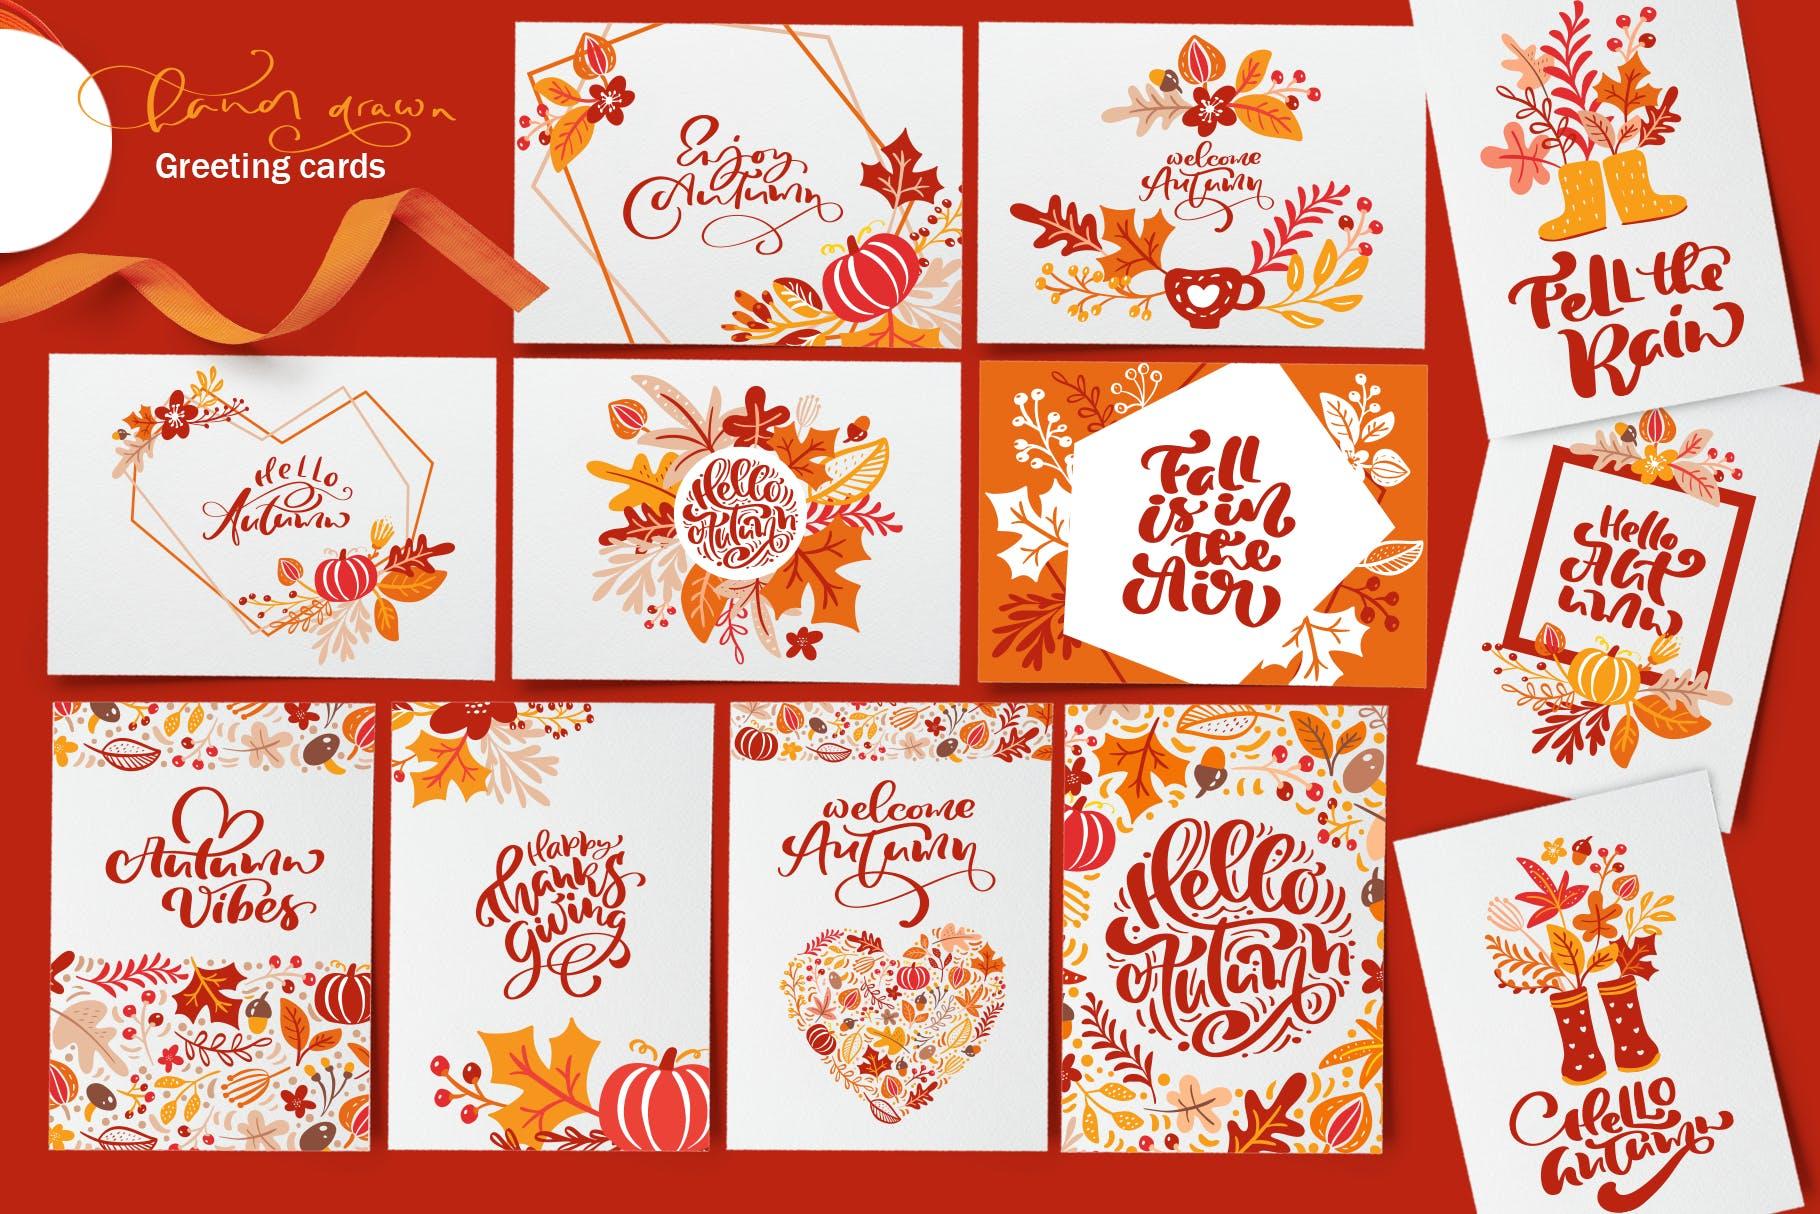 矢量书法和花卉元素图案花纹素材Autumn vector calligraphy floral elements插图(4)